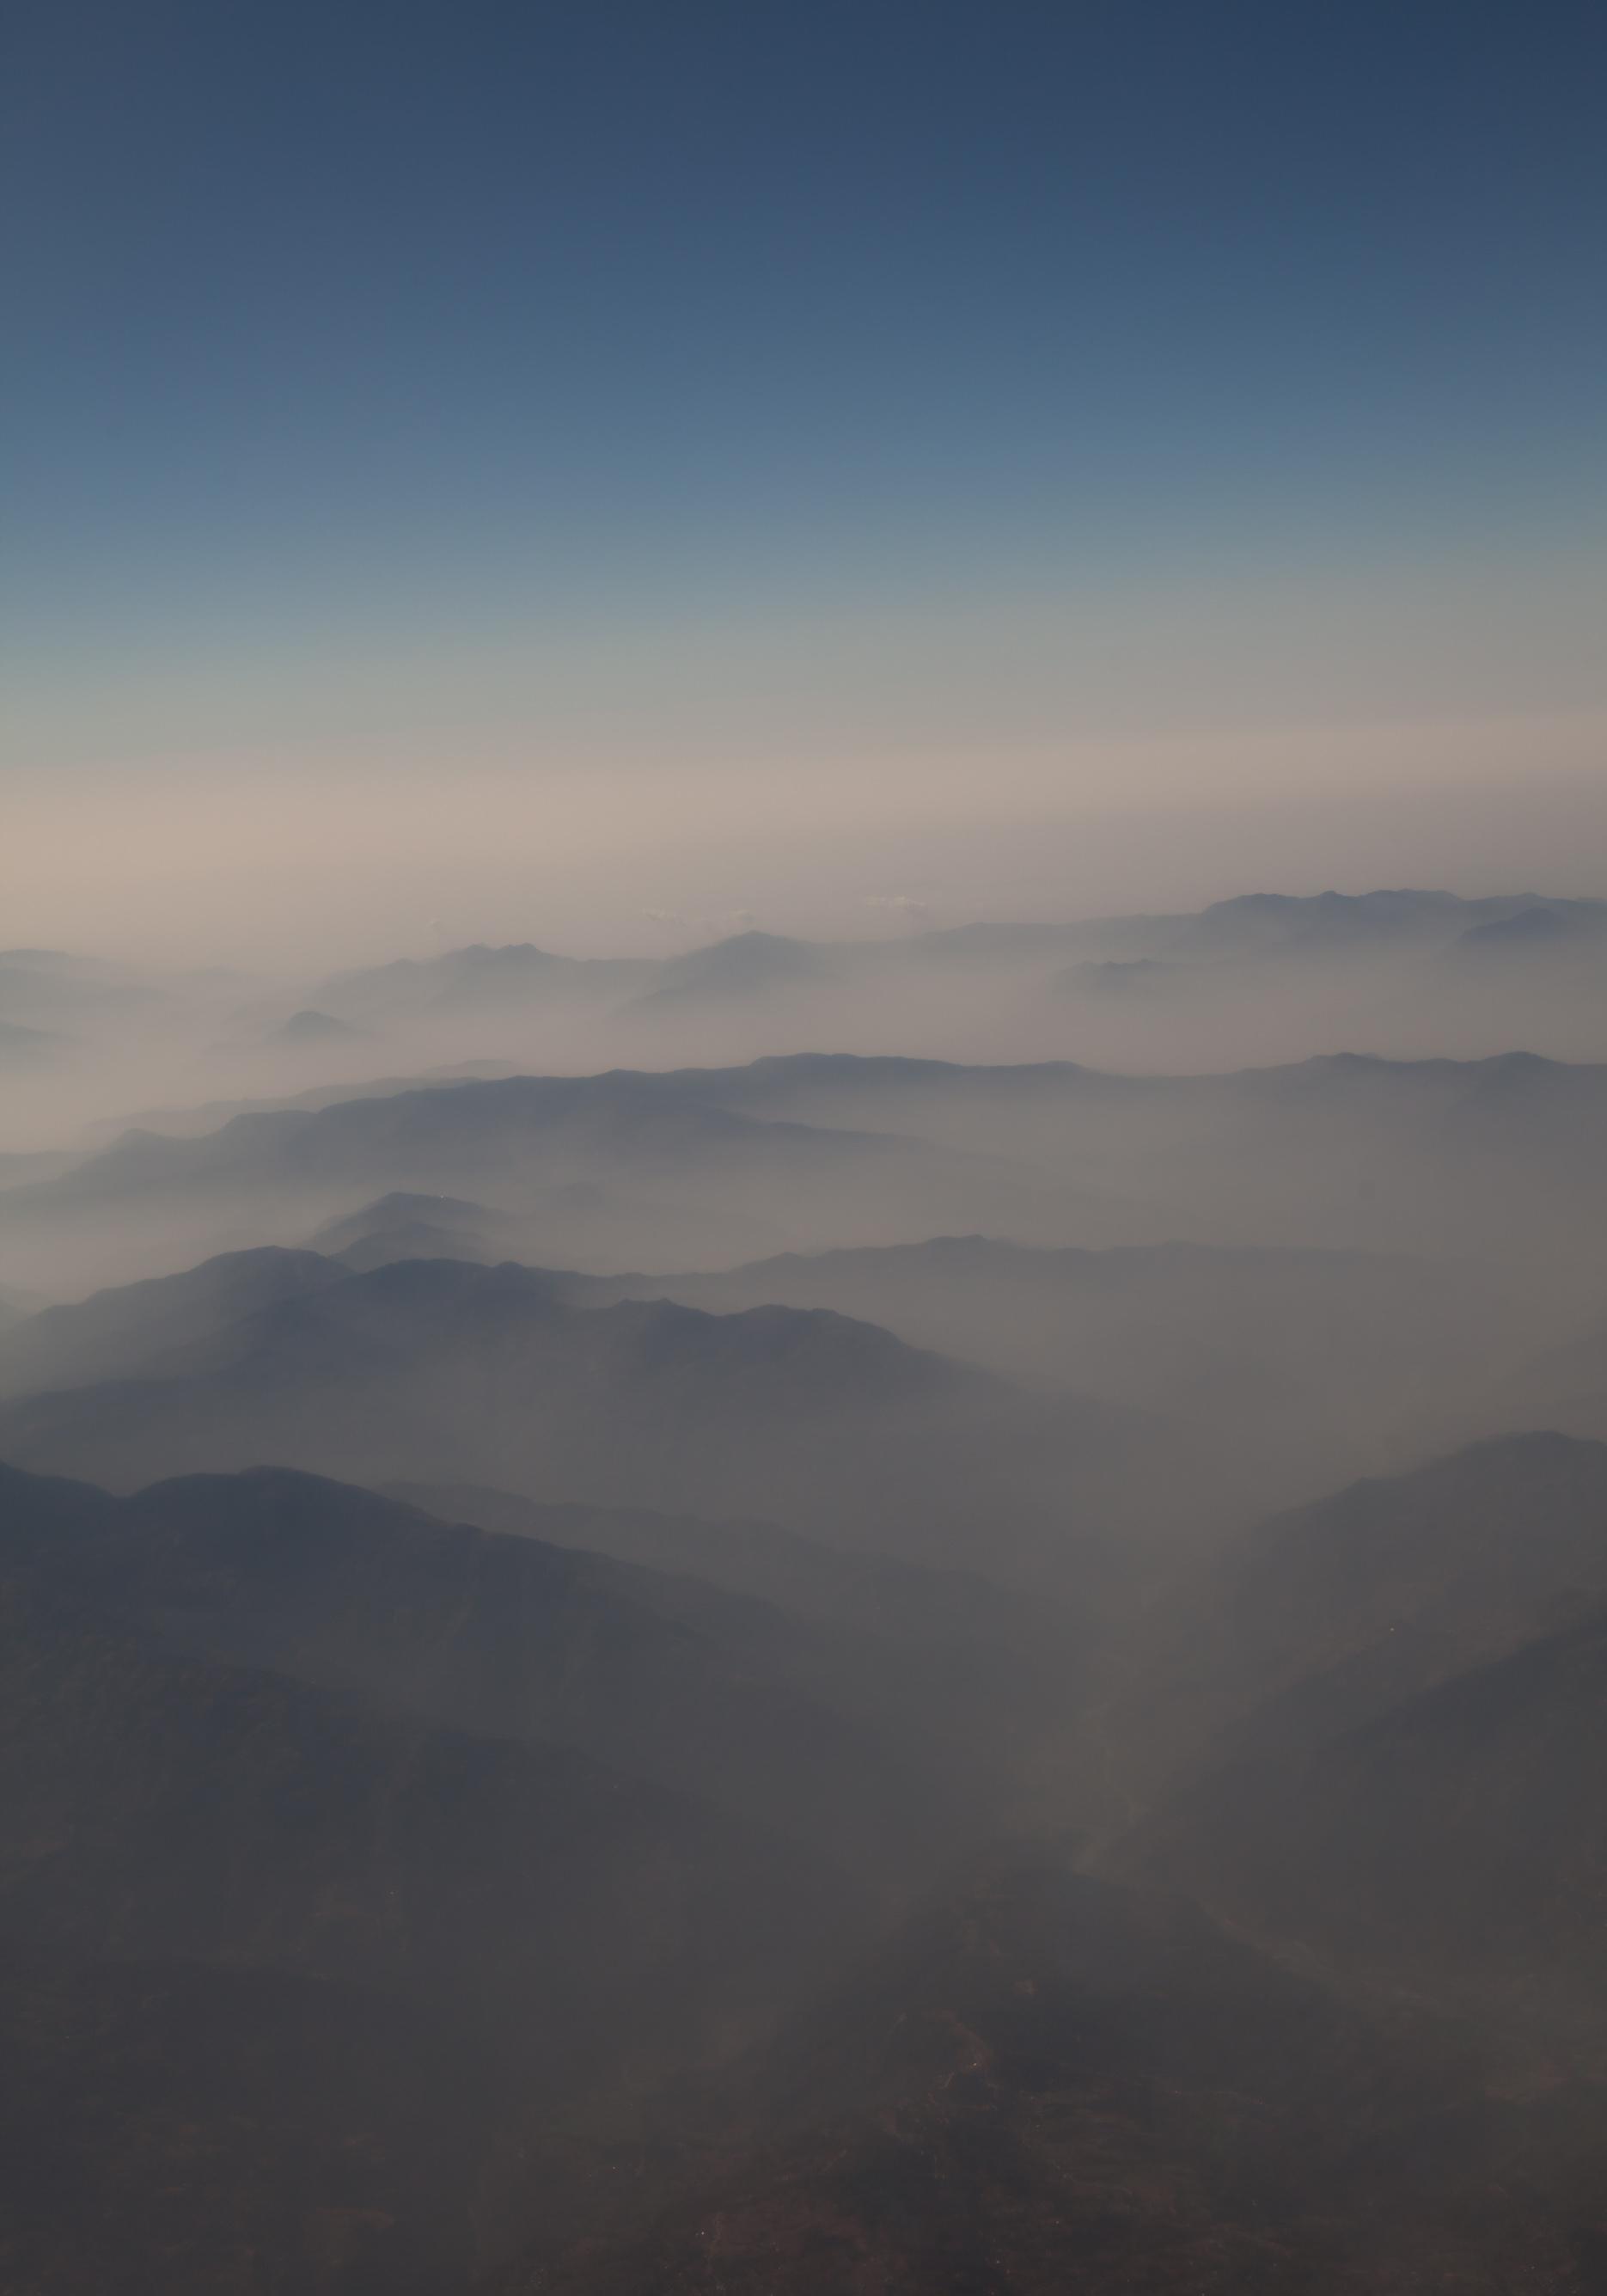 Surrounding Everest